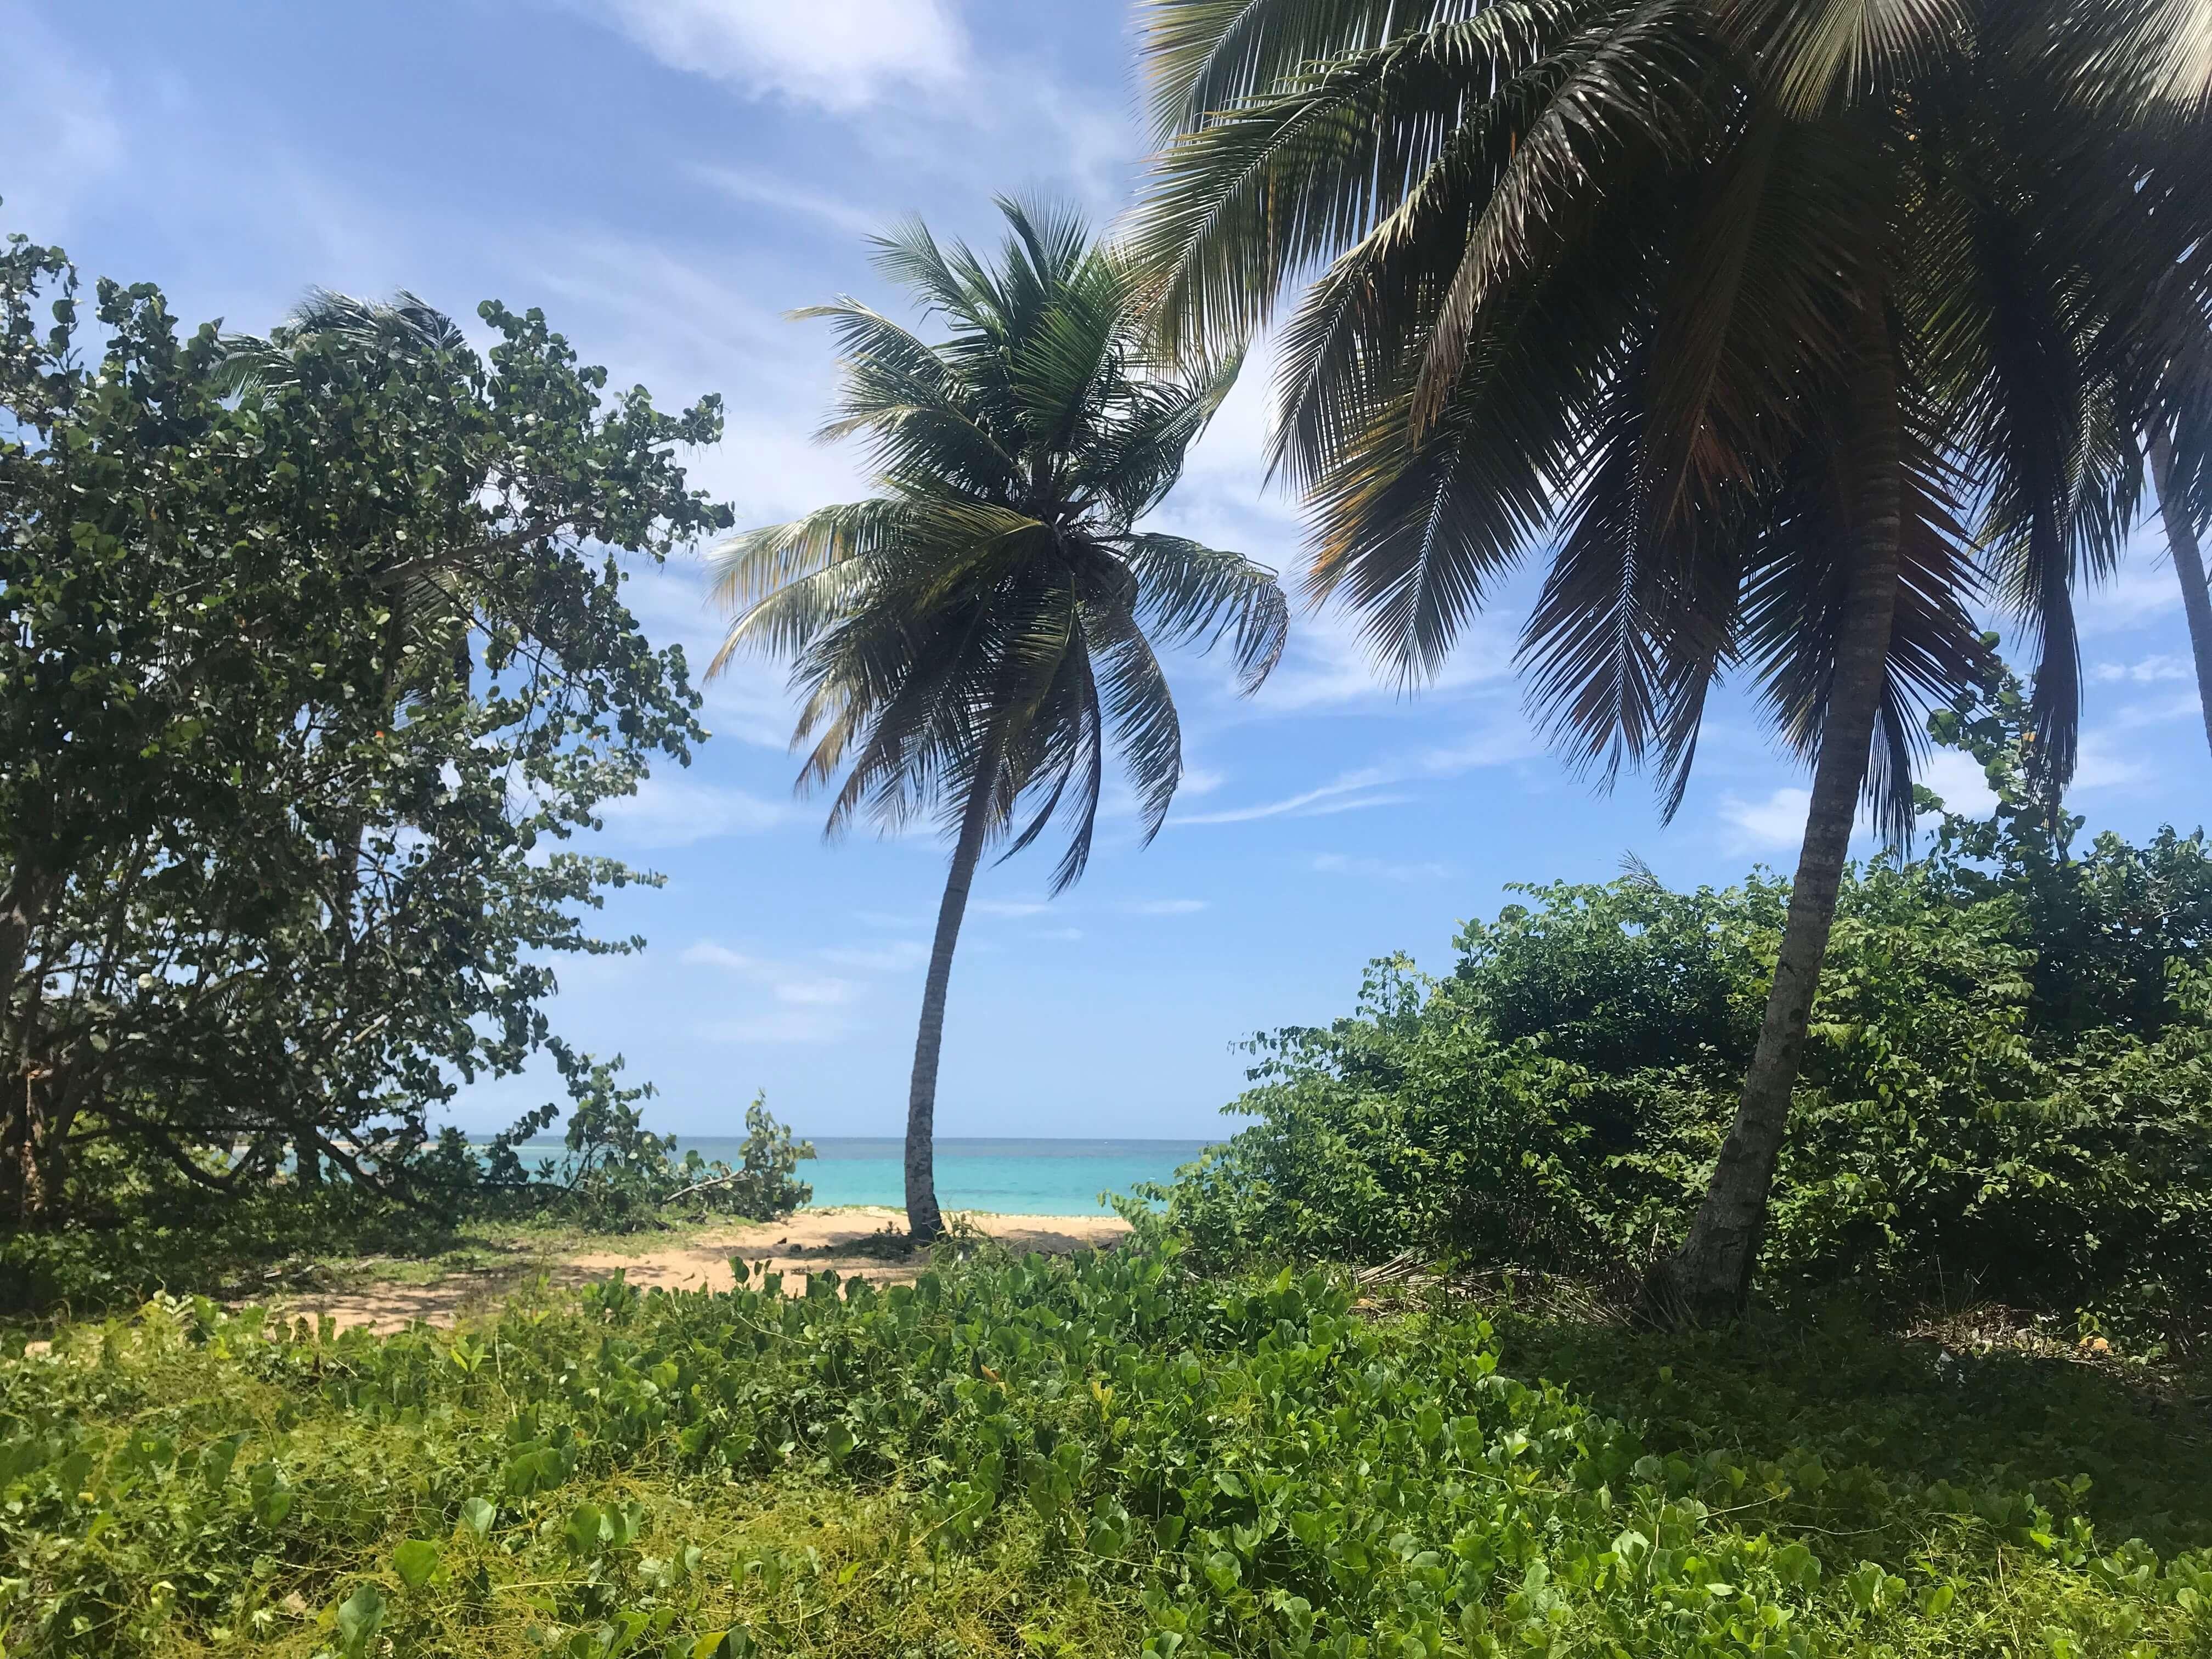 5 Things To Do In Las Terrenas, Dominican Republic